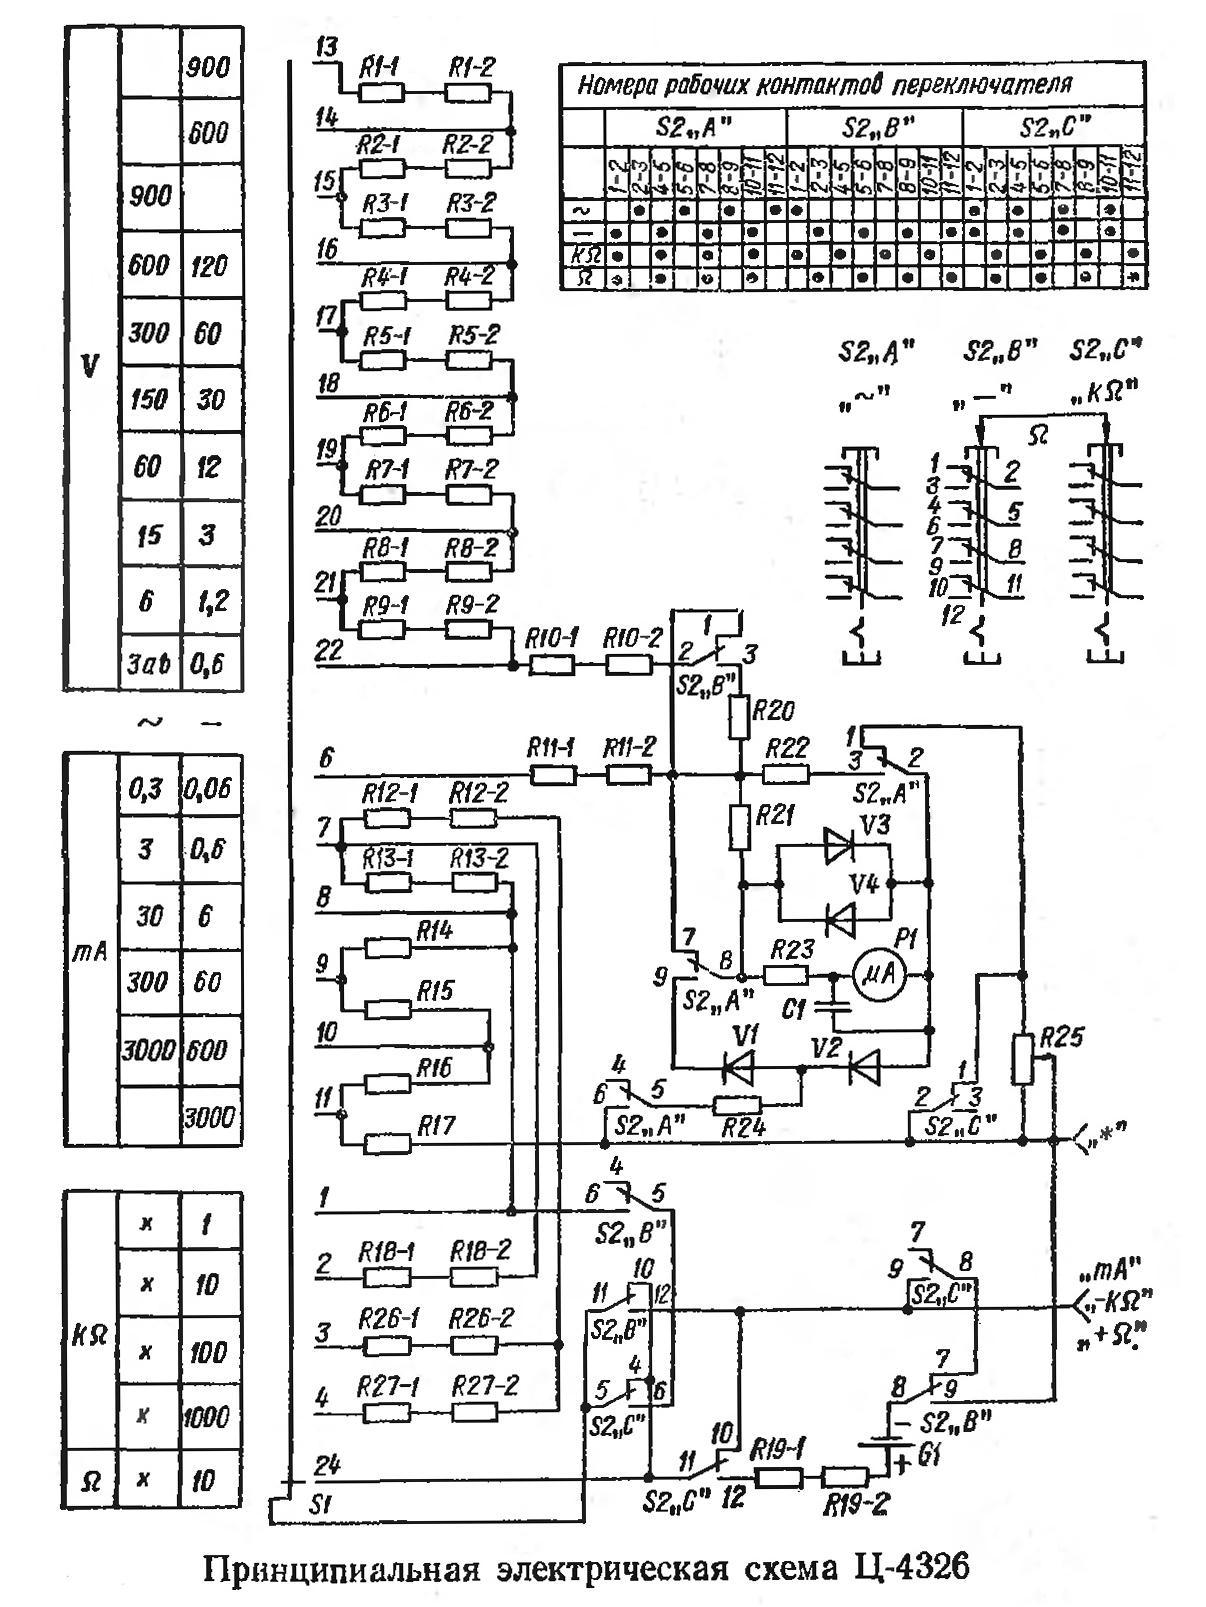 инструкция по эксплуатации тестер типа 43101